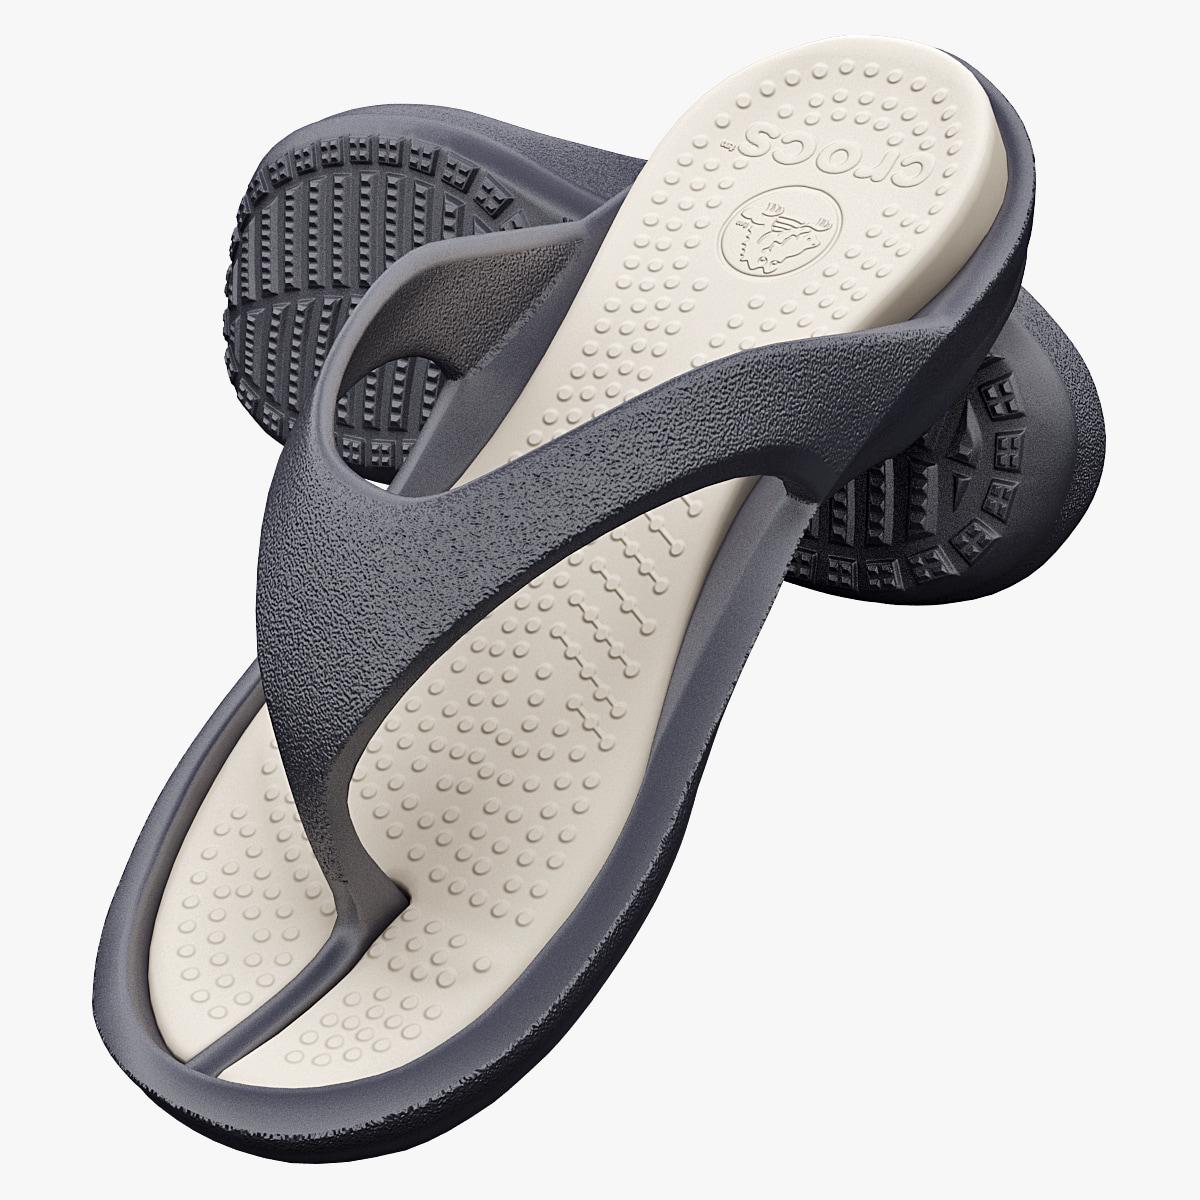 Sandals_Crocs_0001_2.jpg